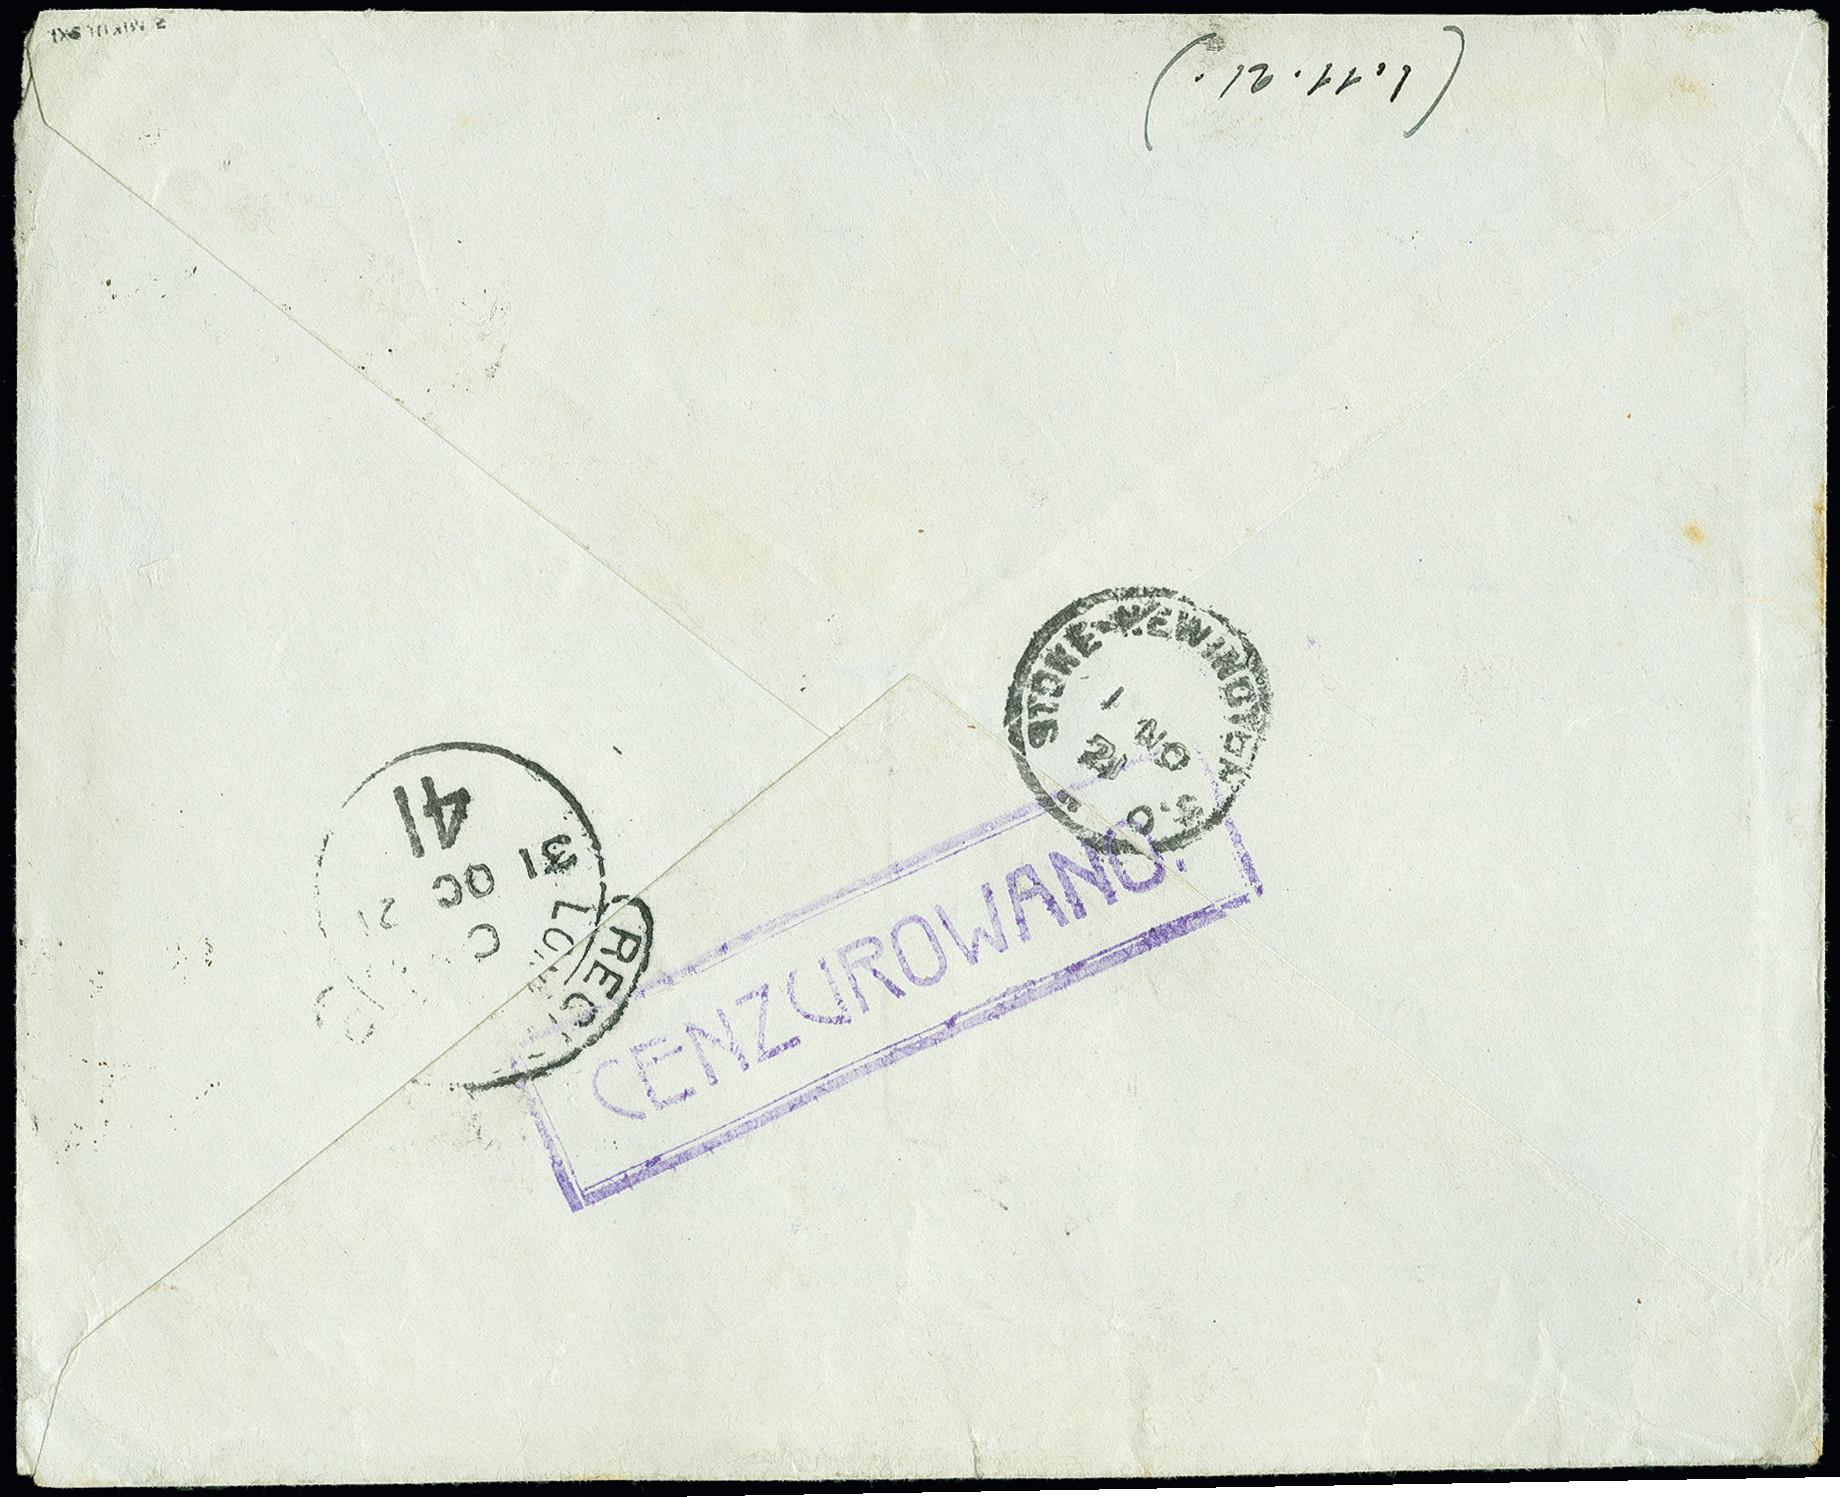 Lot 1159 - europa central lithuania -  Heinrich Koehler Auktionen 375rd Heinrich Köhler auction - Day 1